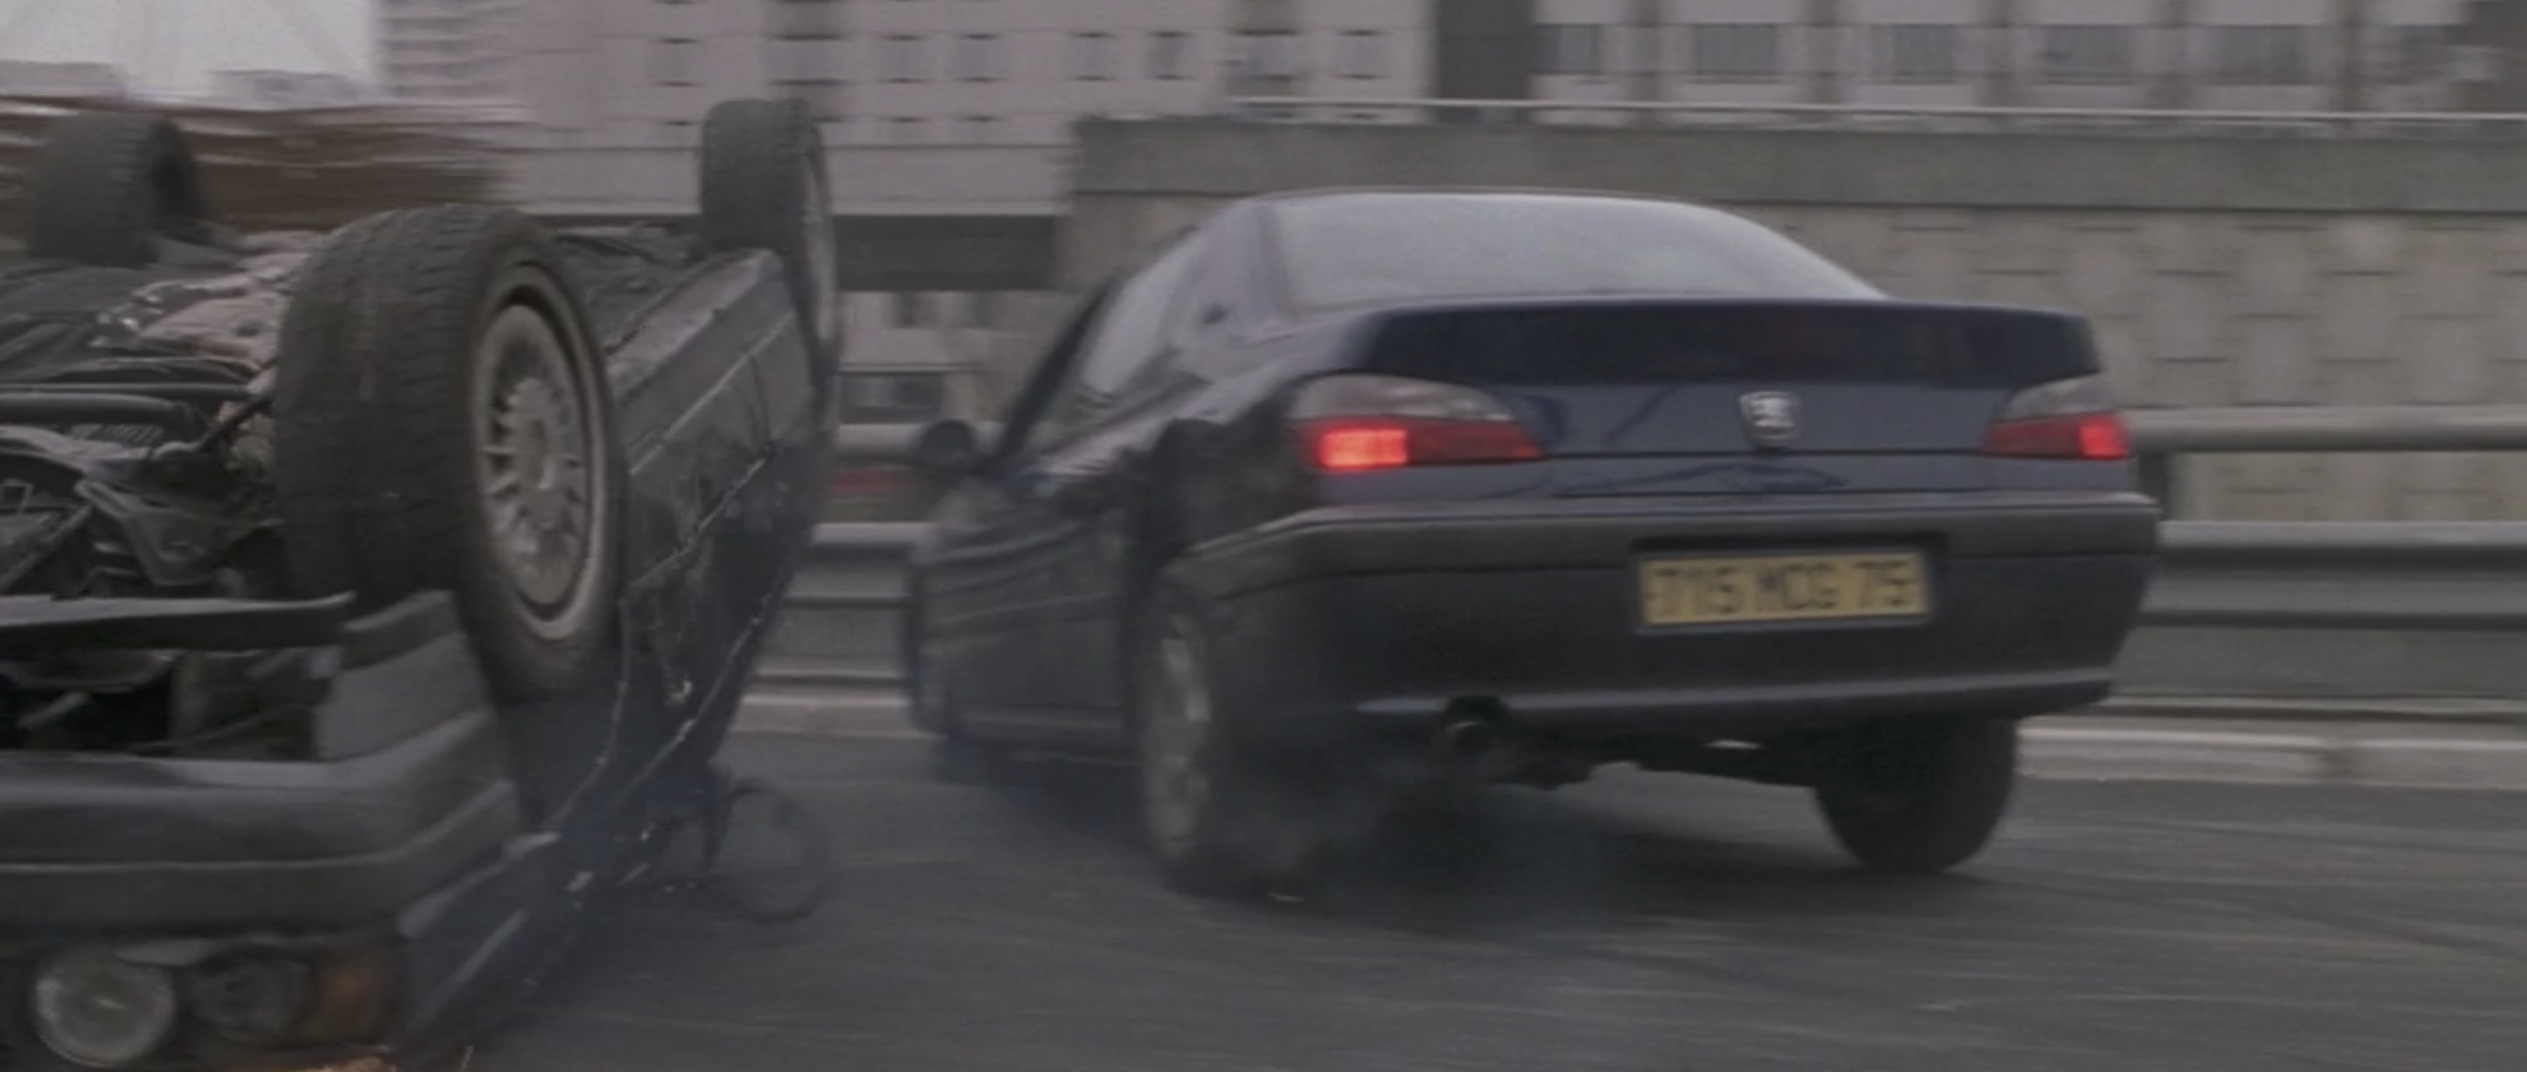 Ronin car crash